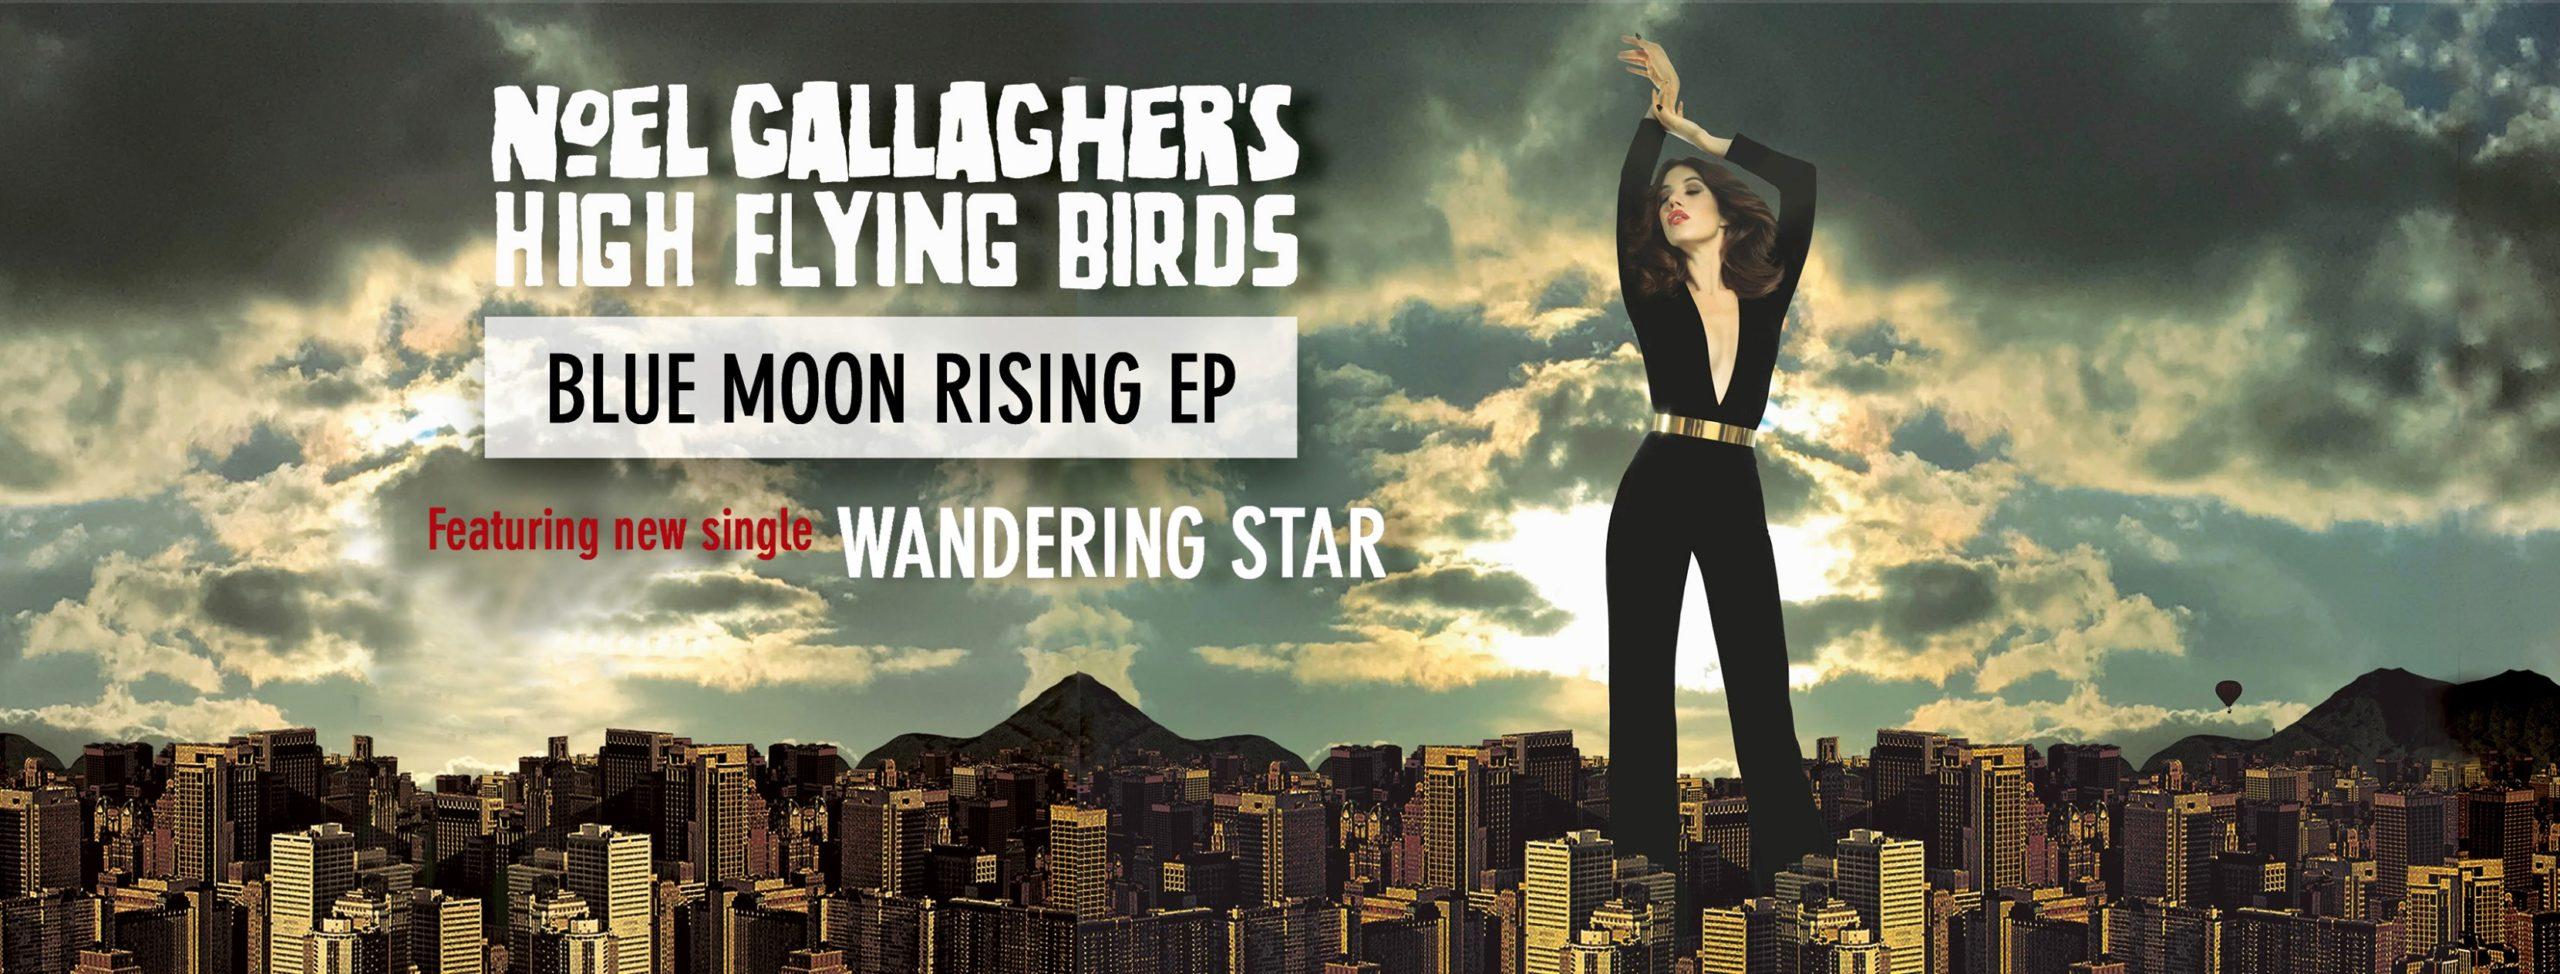 Blue Moon Rising - Noel Gallagher's High Flying Birds